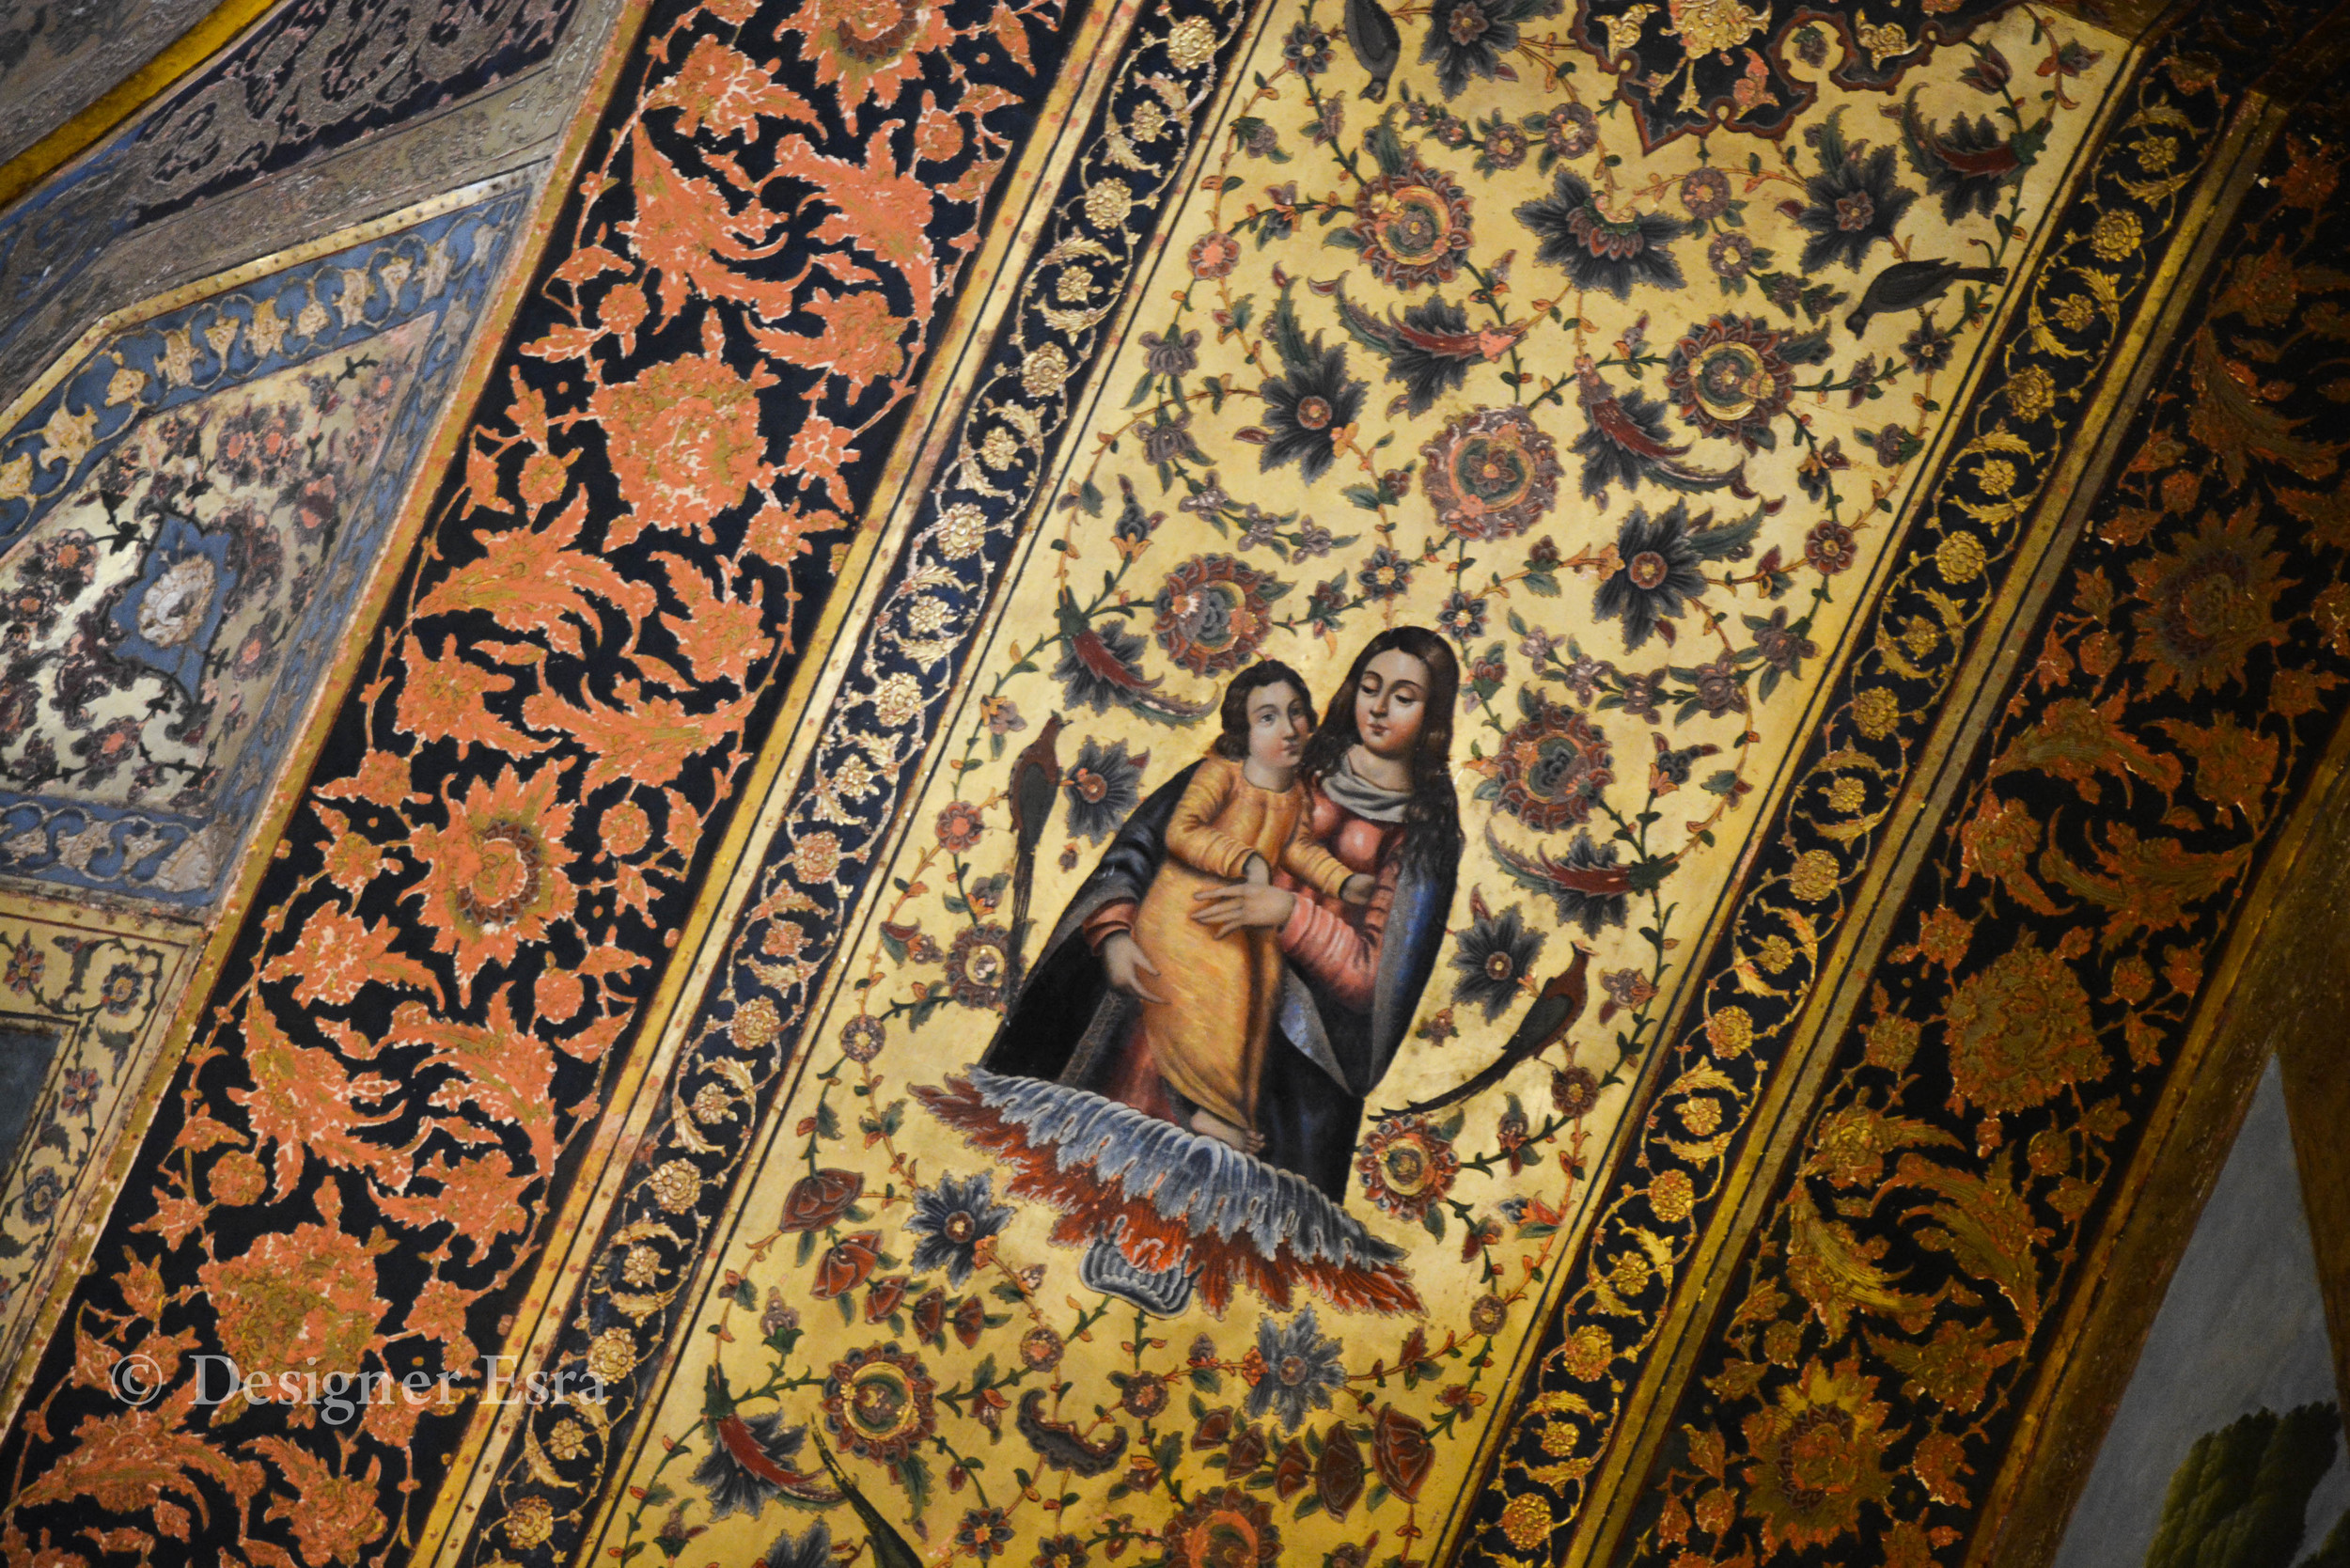 Christian Icon Painting and Illumination in Iran